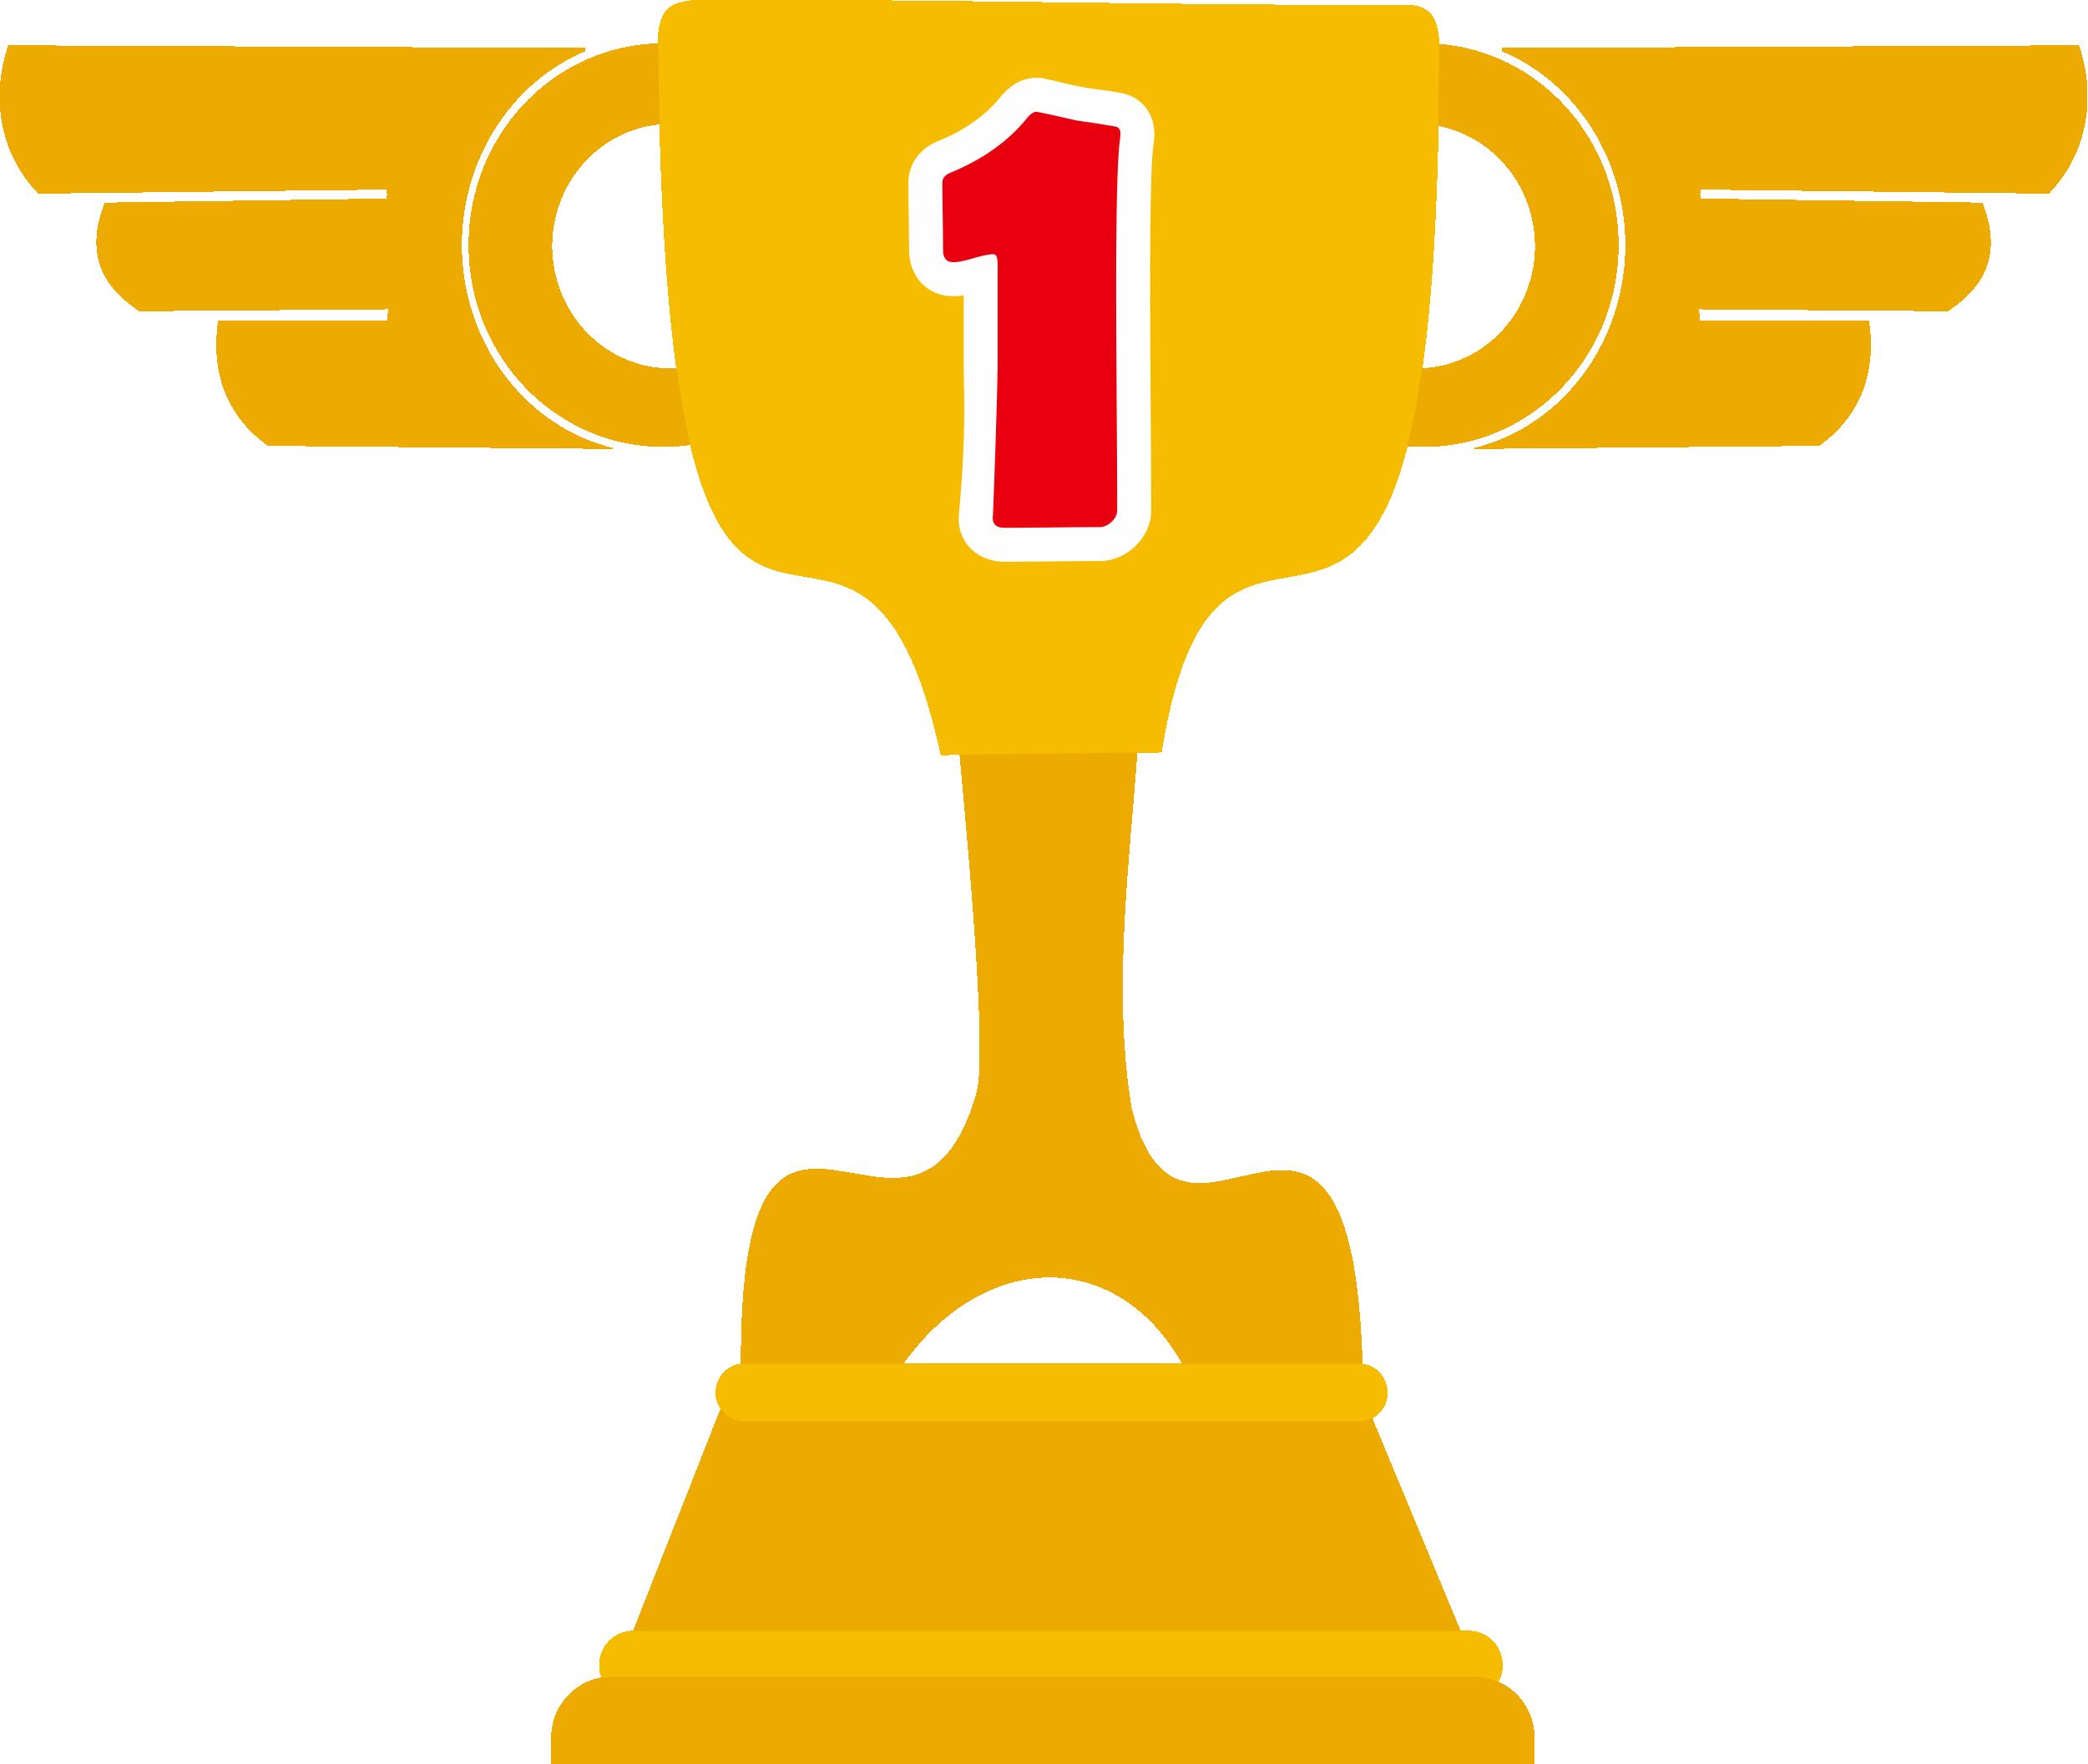 Race clipart trophy. Iunse rc fdro png